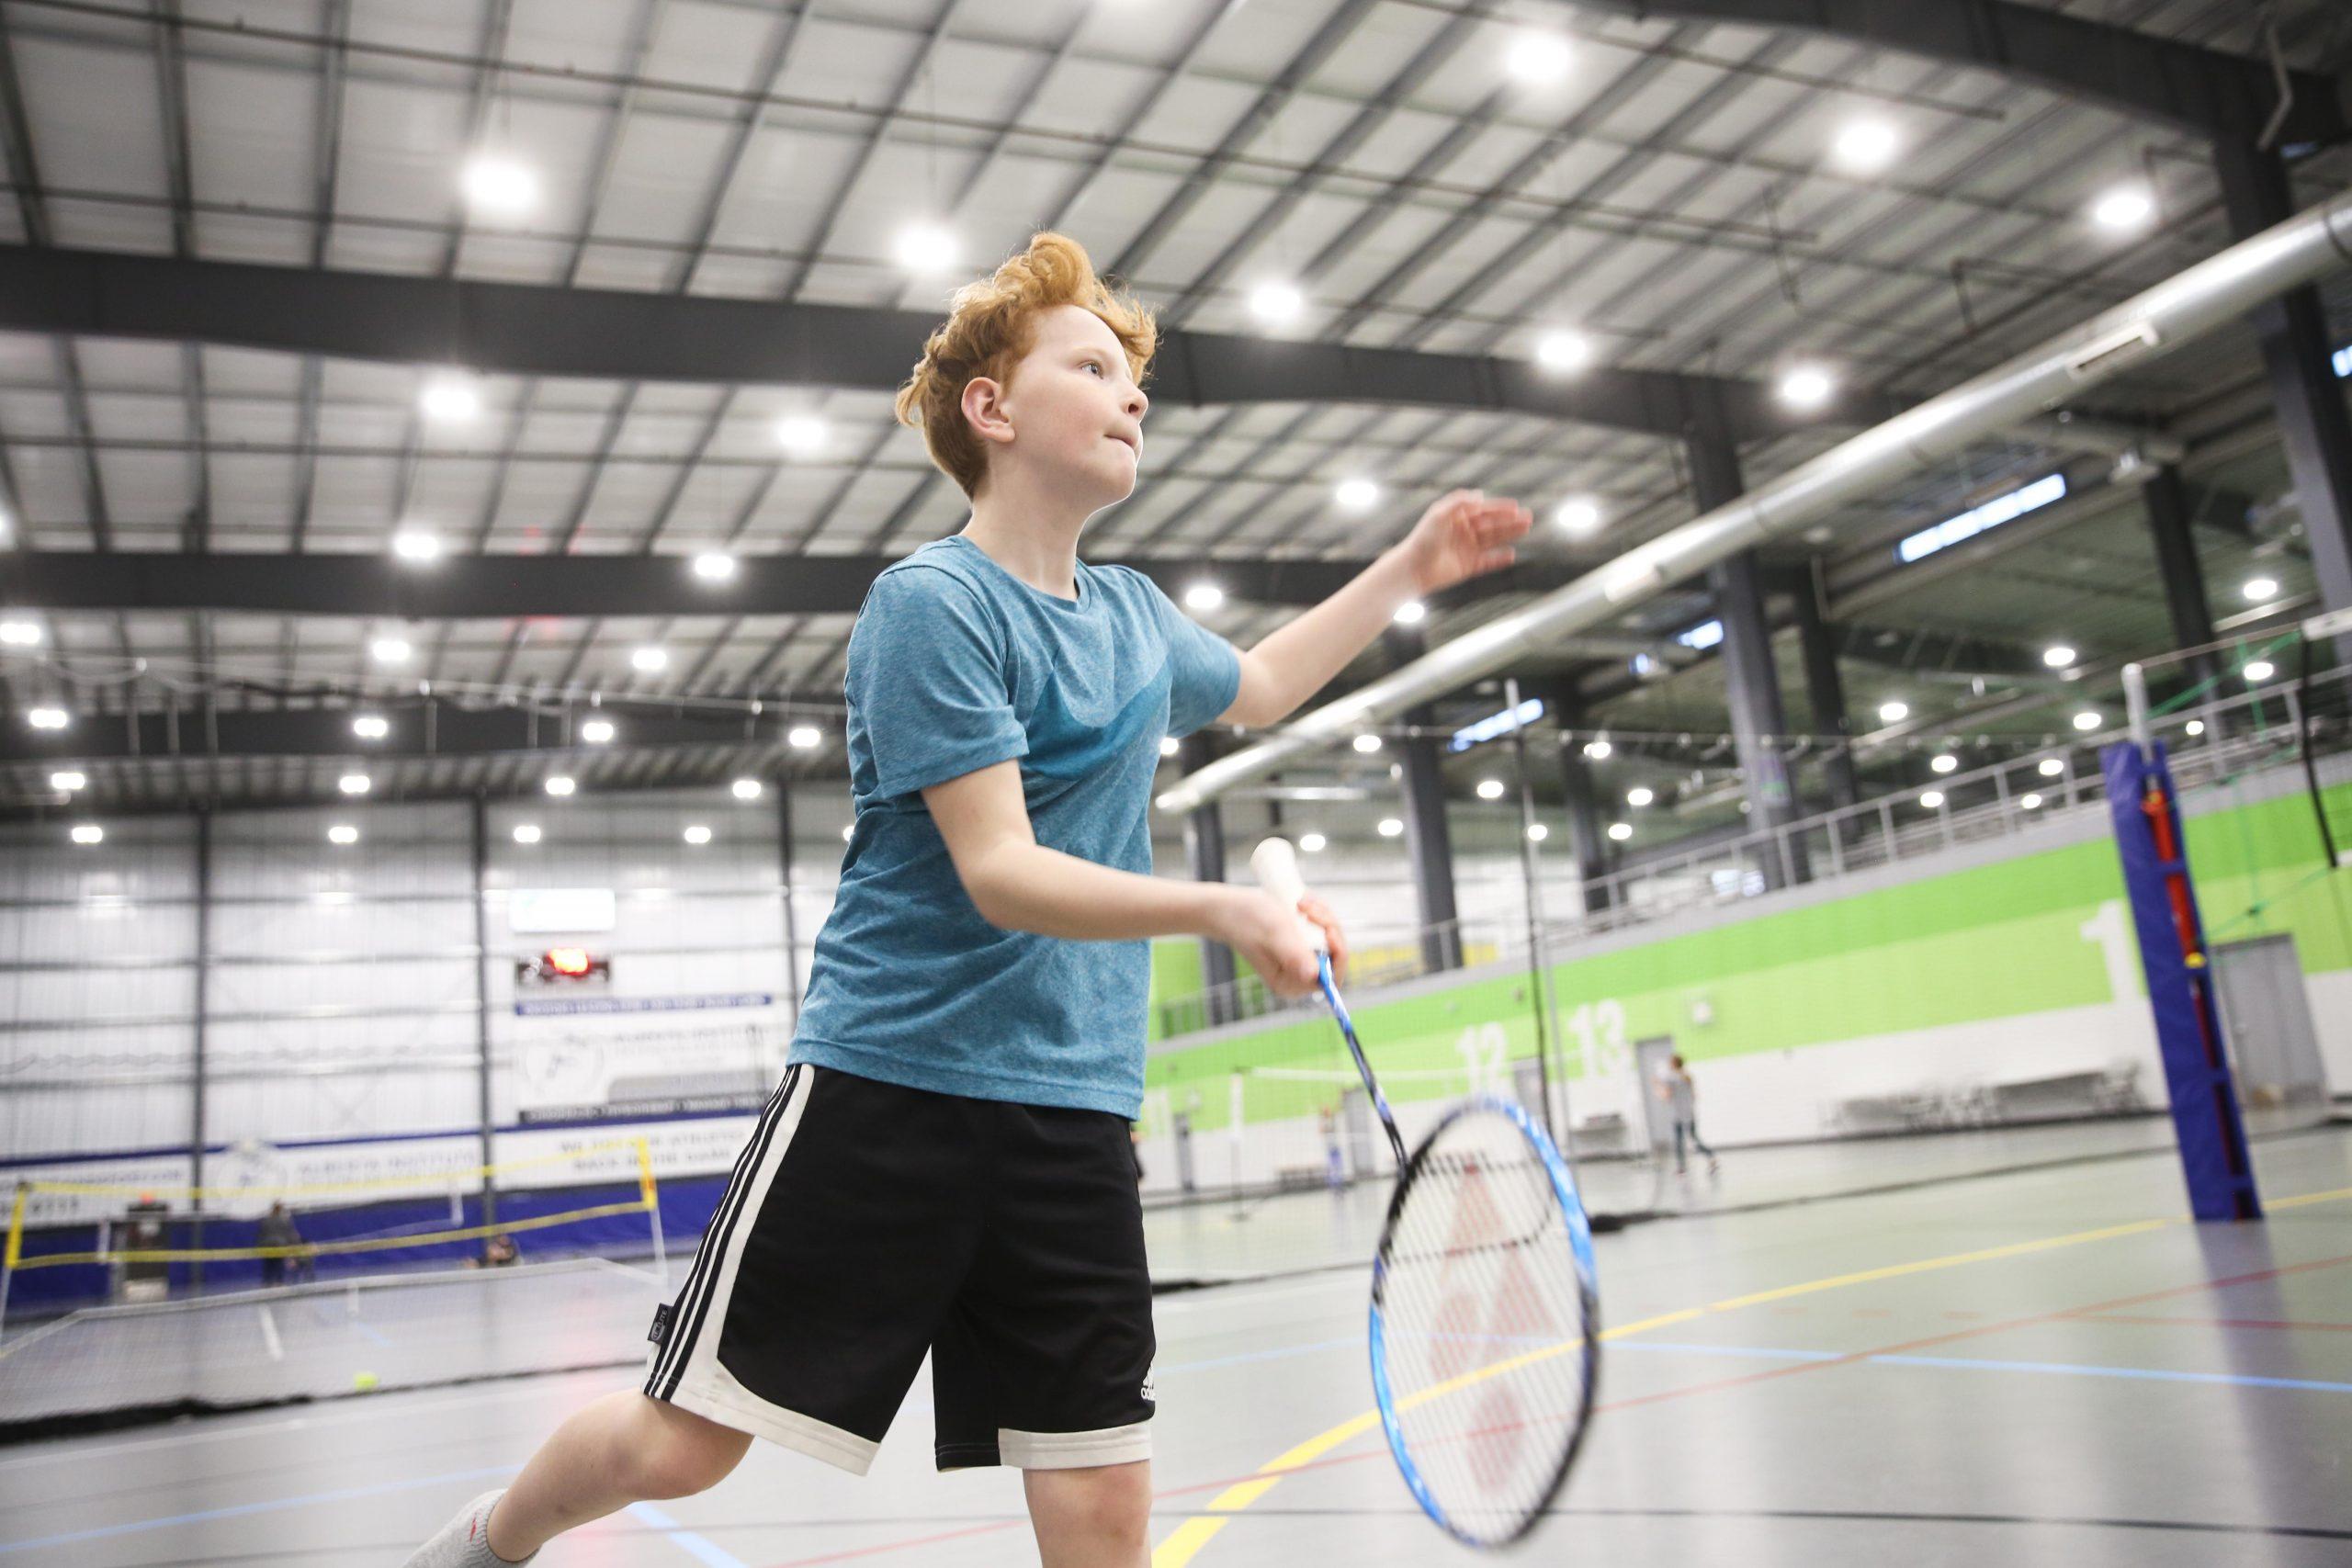 Badminton machines